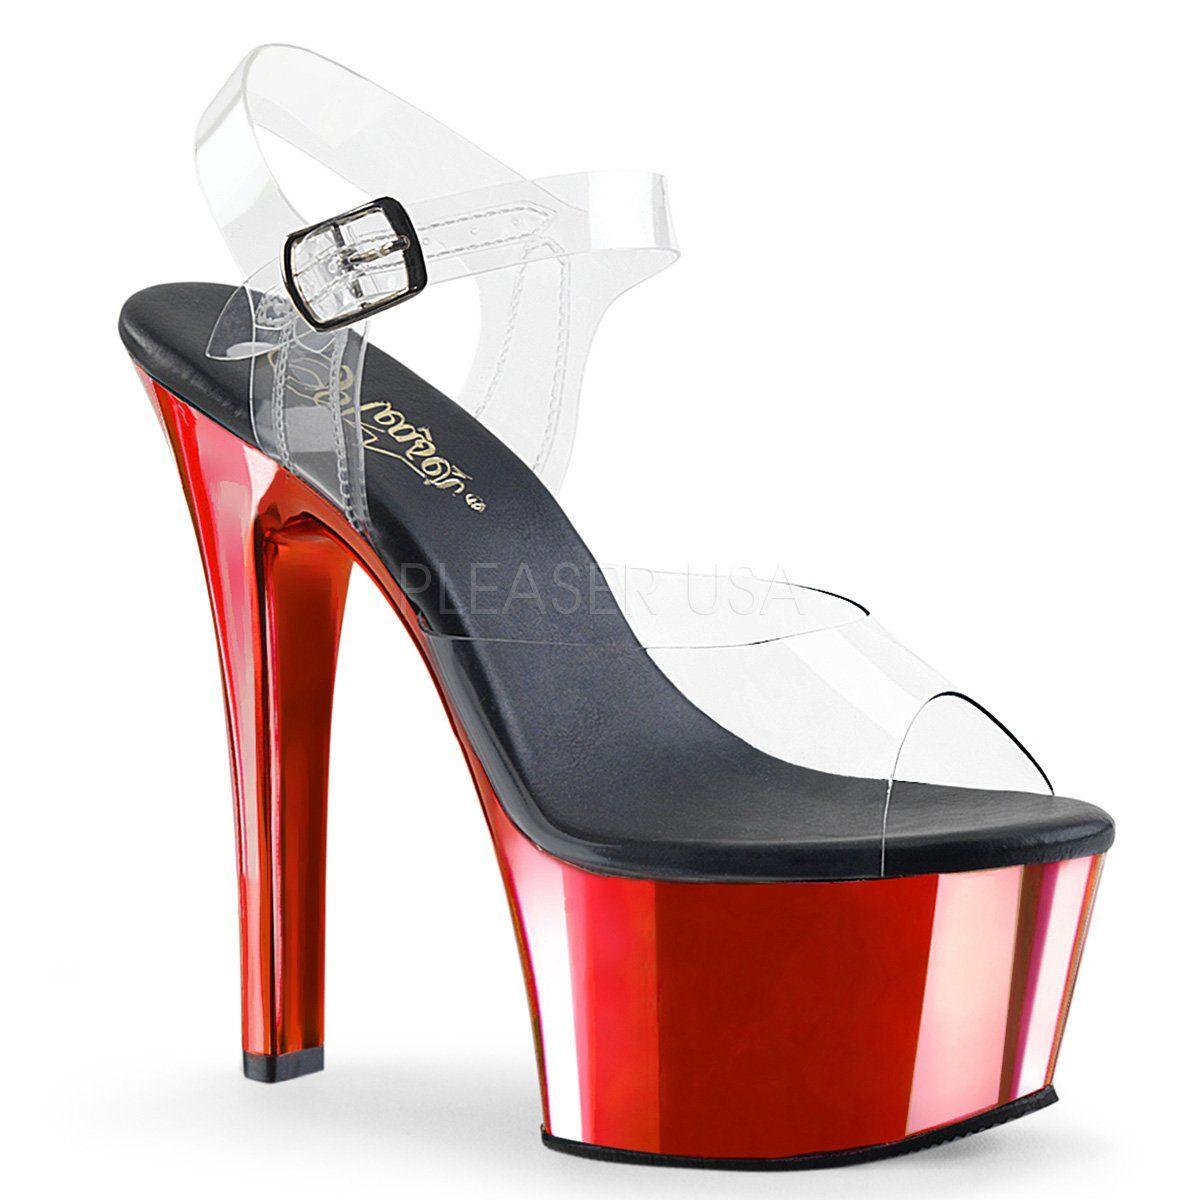 ASPIRE-608T 6/'/' Heel 2 1//4/'/' Tinted Platform Ankle Strap Sandal by PleaserUSA